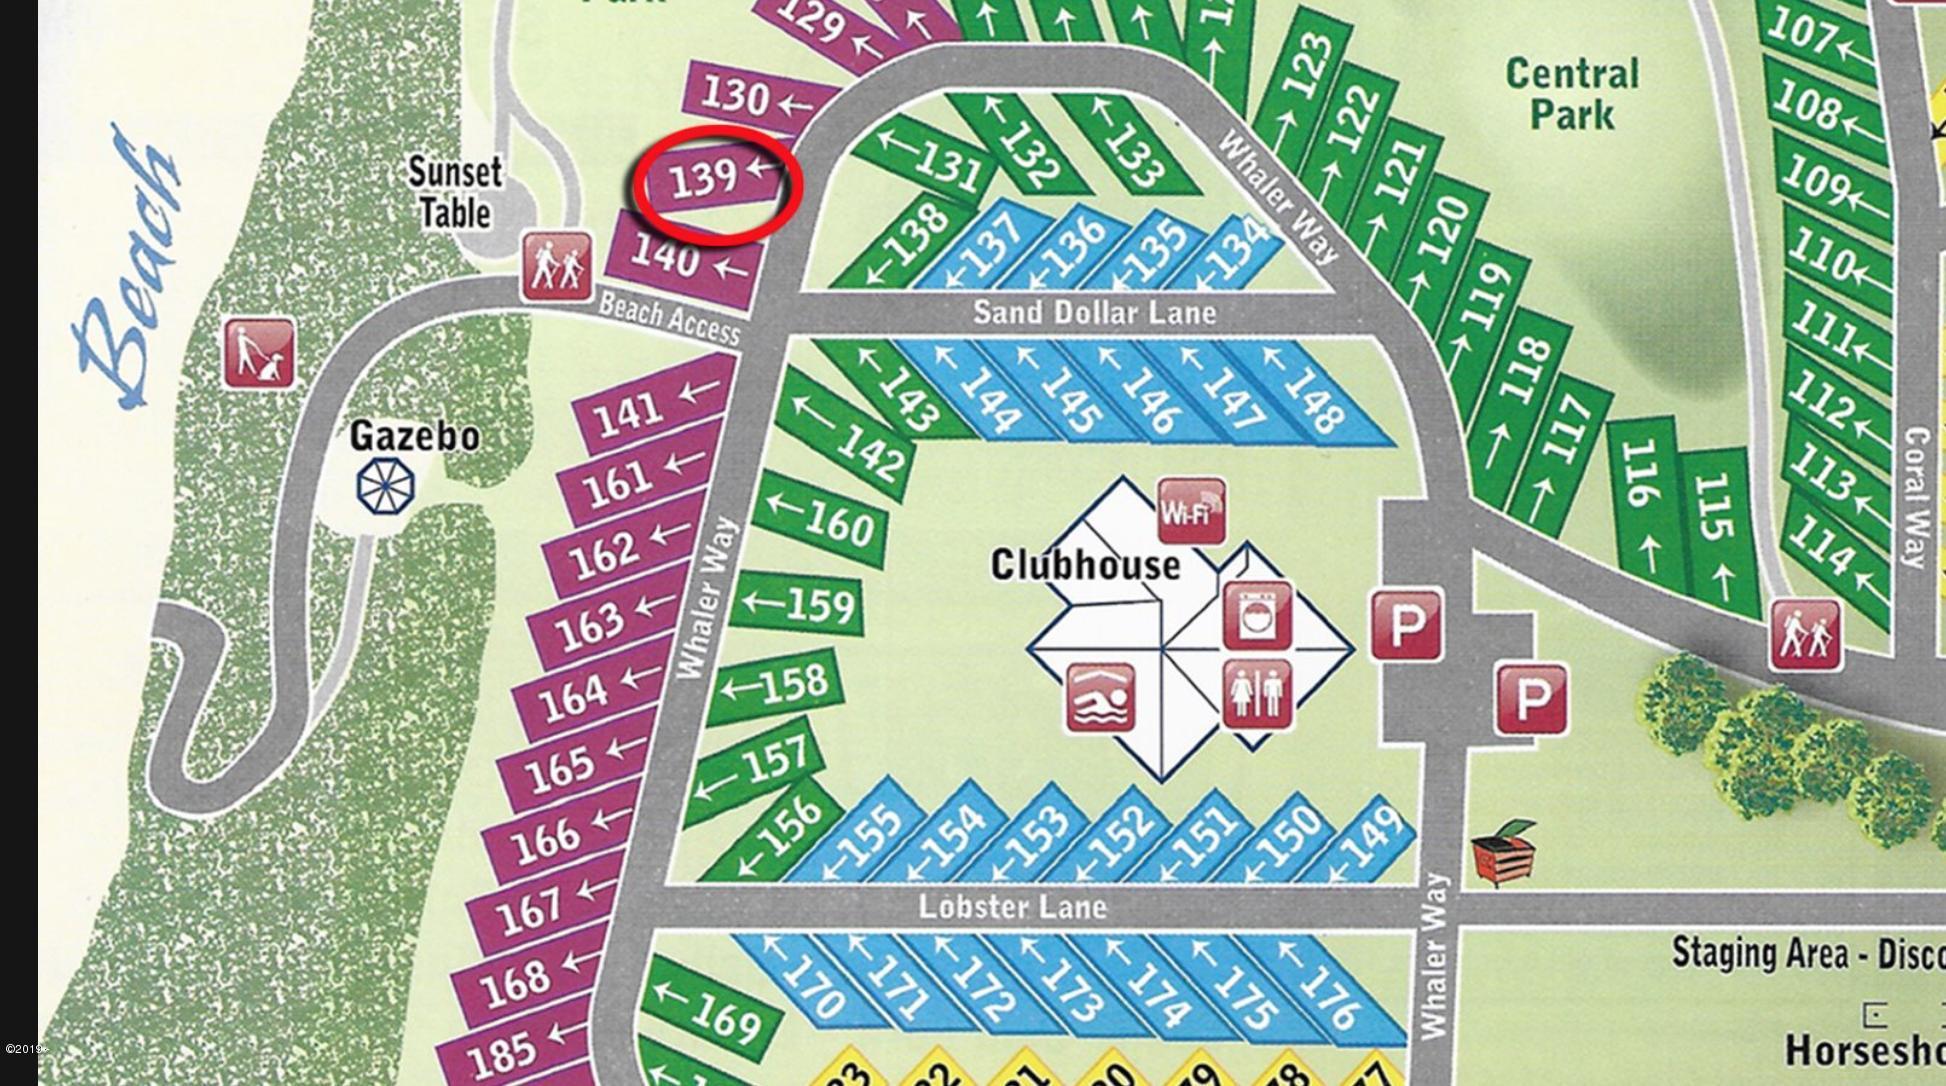 6225 N. Coast Hwy Lot 139, Newport, OR 97365 - Location of lot 139